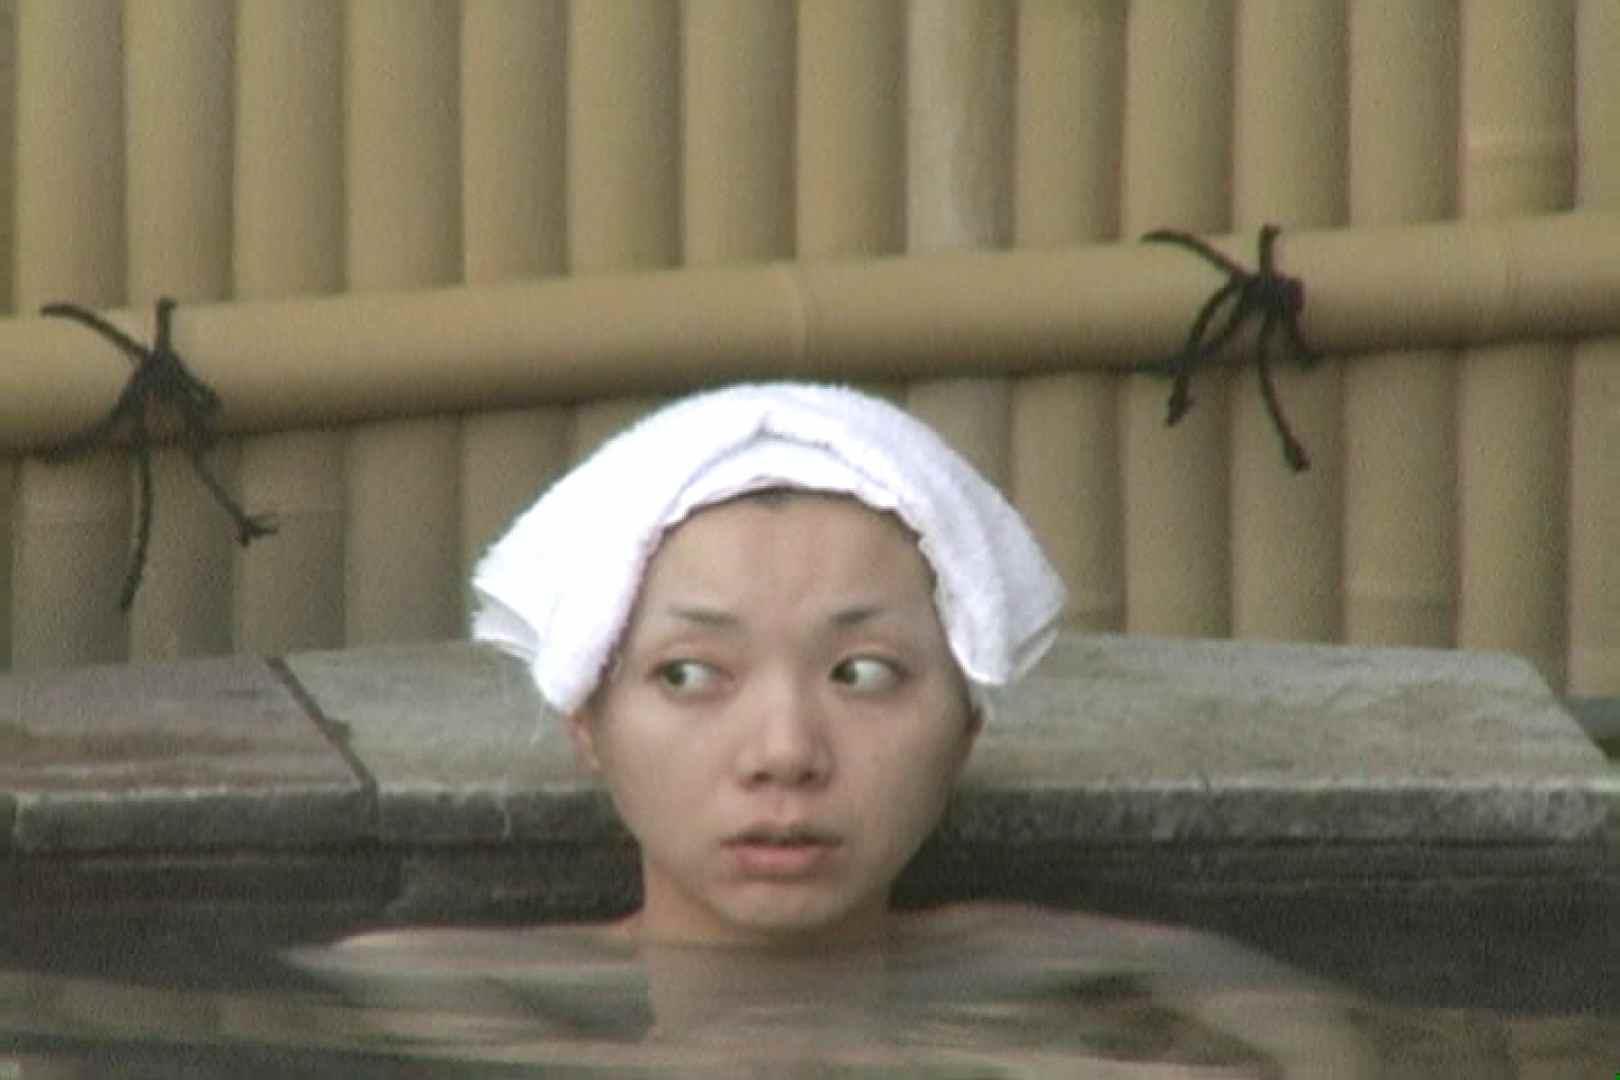 Aquaな露天風呂Vol.630 HなOL セックス無修正動画無料 87pic 38